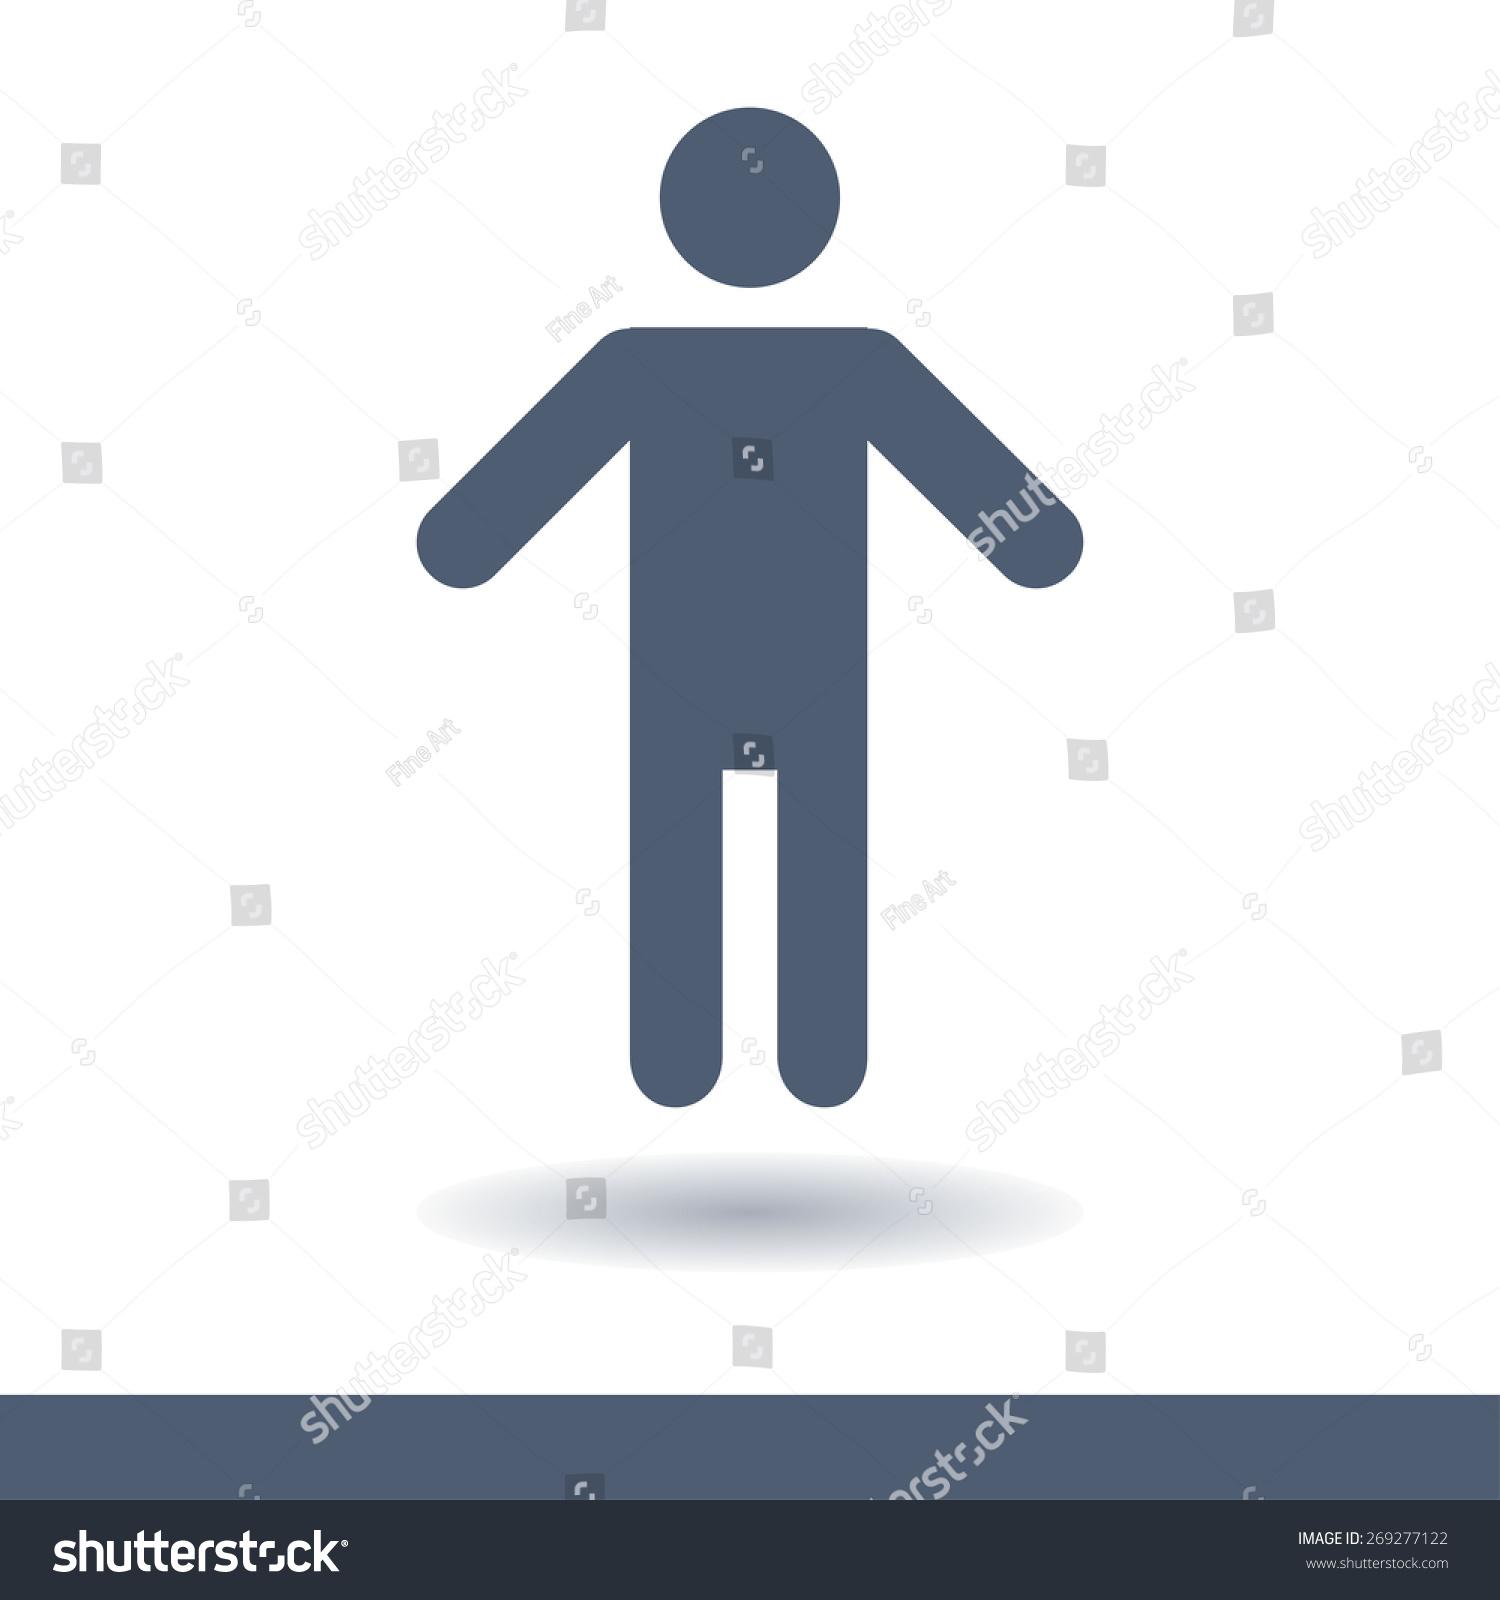 Human男性能够像。马恩默许symbol。男性吃饭。平坦的风格。EPS 10。 - 科技,符号/标志 - 站酷海洛创意正版图片,视频,音乐素材交易平台 - Shutterstock中国独家合作伙伴 - 站酷旗下品牌